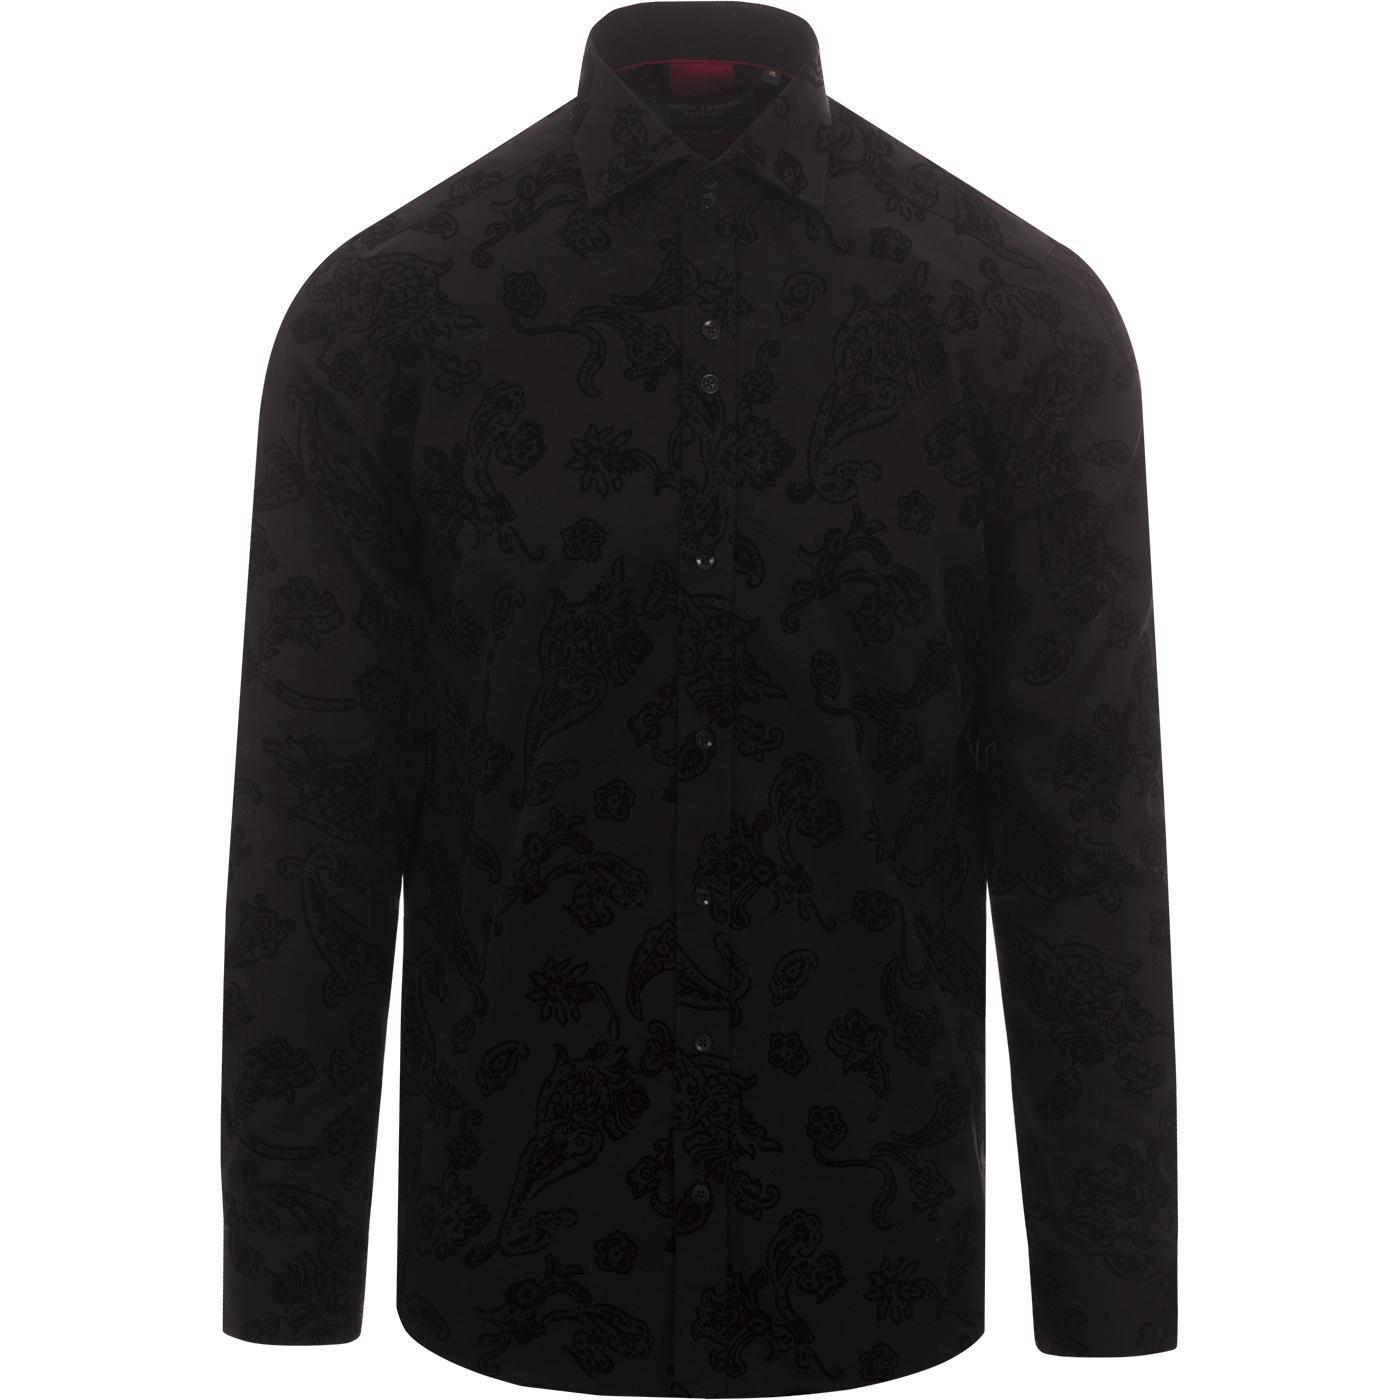 GUIDE LONDON Mod Baroque Paisley Flock Shirt (B)